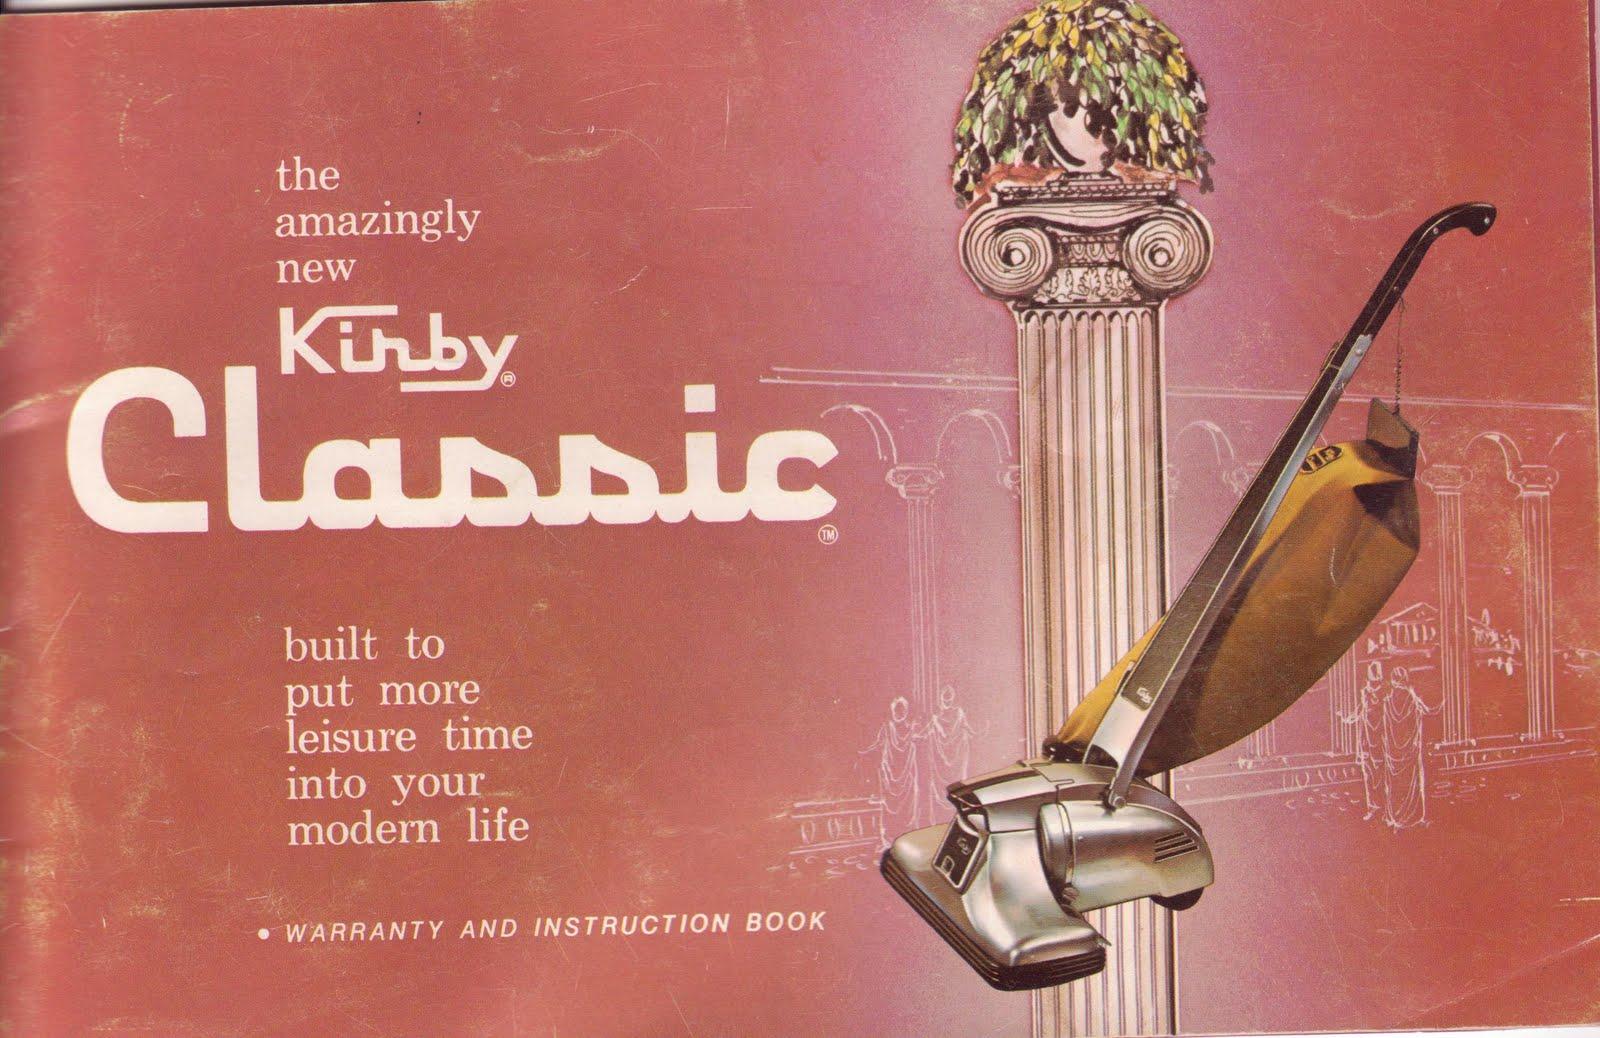 aspiradoras kirby en venta eBay